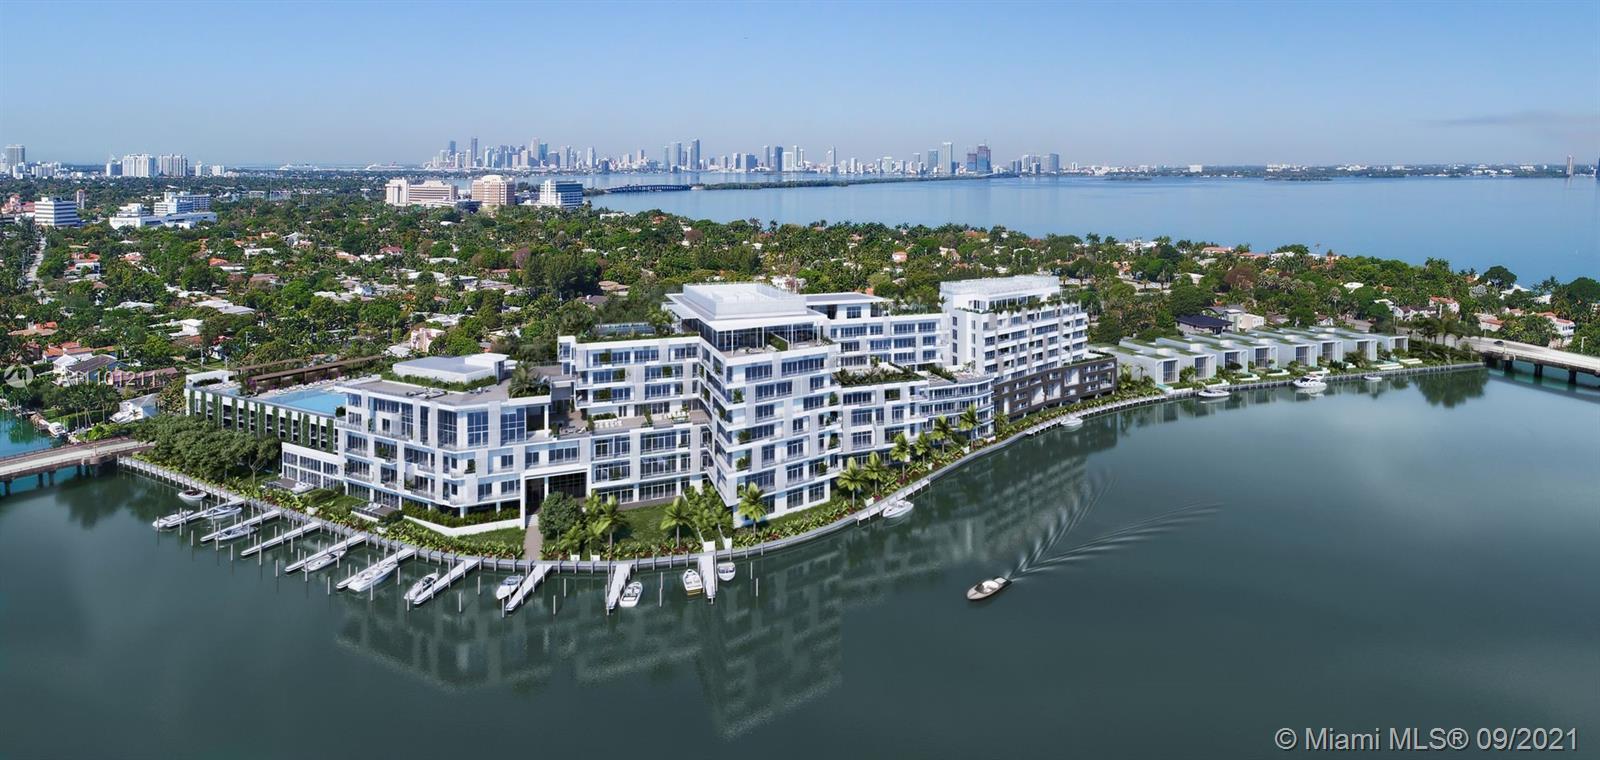 Single Family Home,For Sale,830 W 47th Court, Miami Beach, Florida 33140,Brickell,realty,broker,condos near me